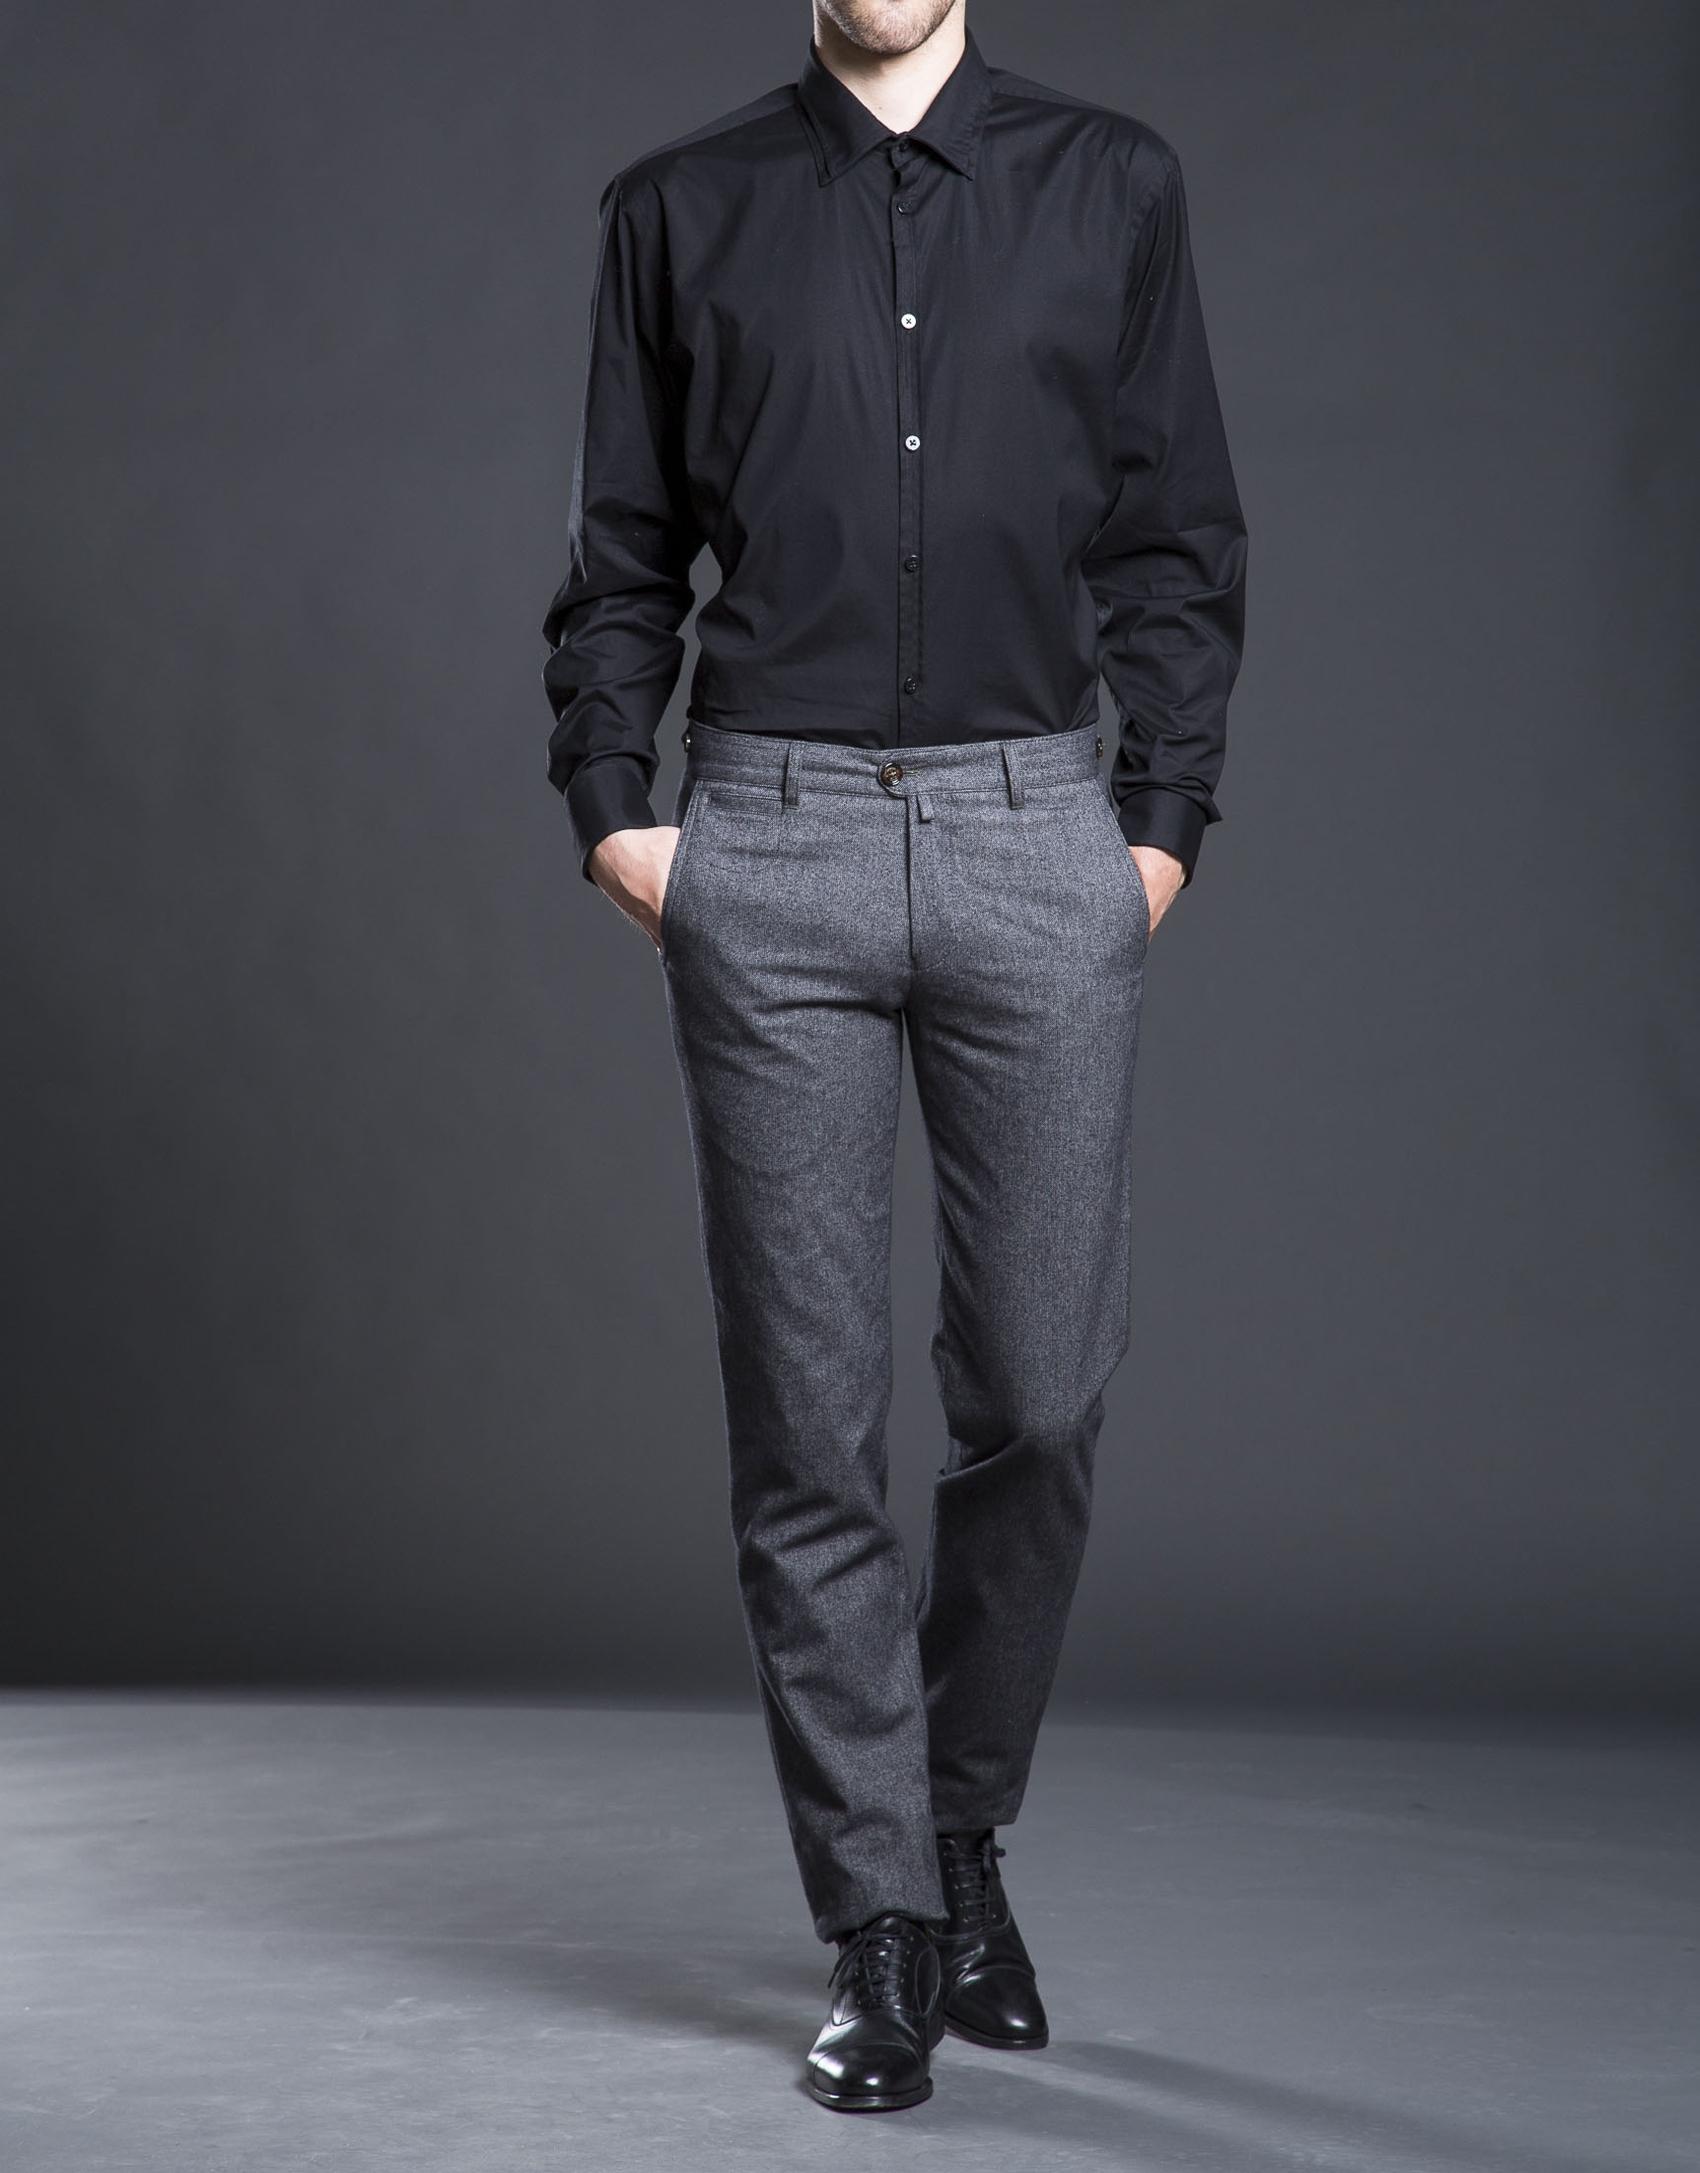 Plain black dress shirt - Roberto Verino